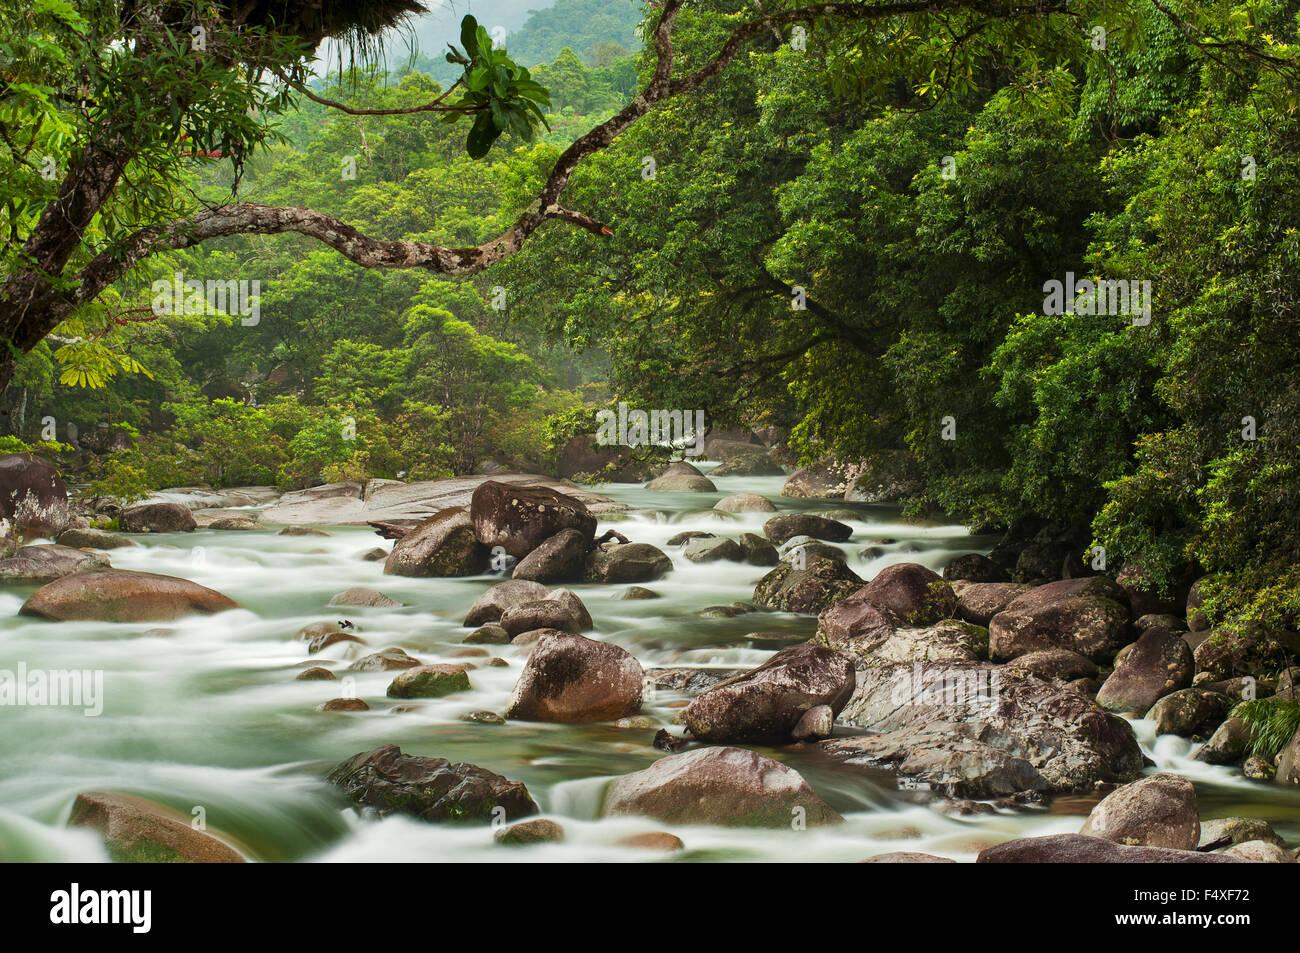 Rainforest scenery in Mossman Gorge. - Stock Image